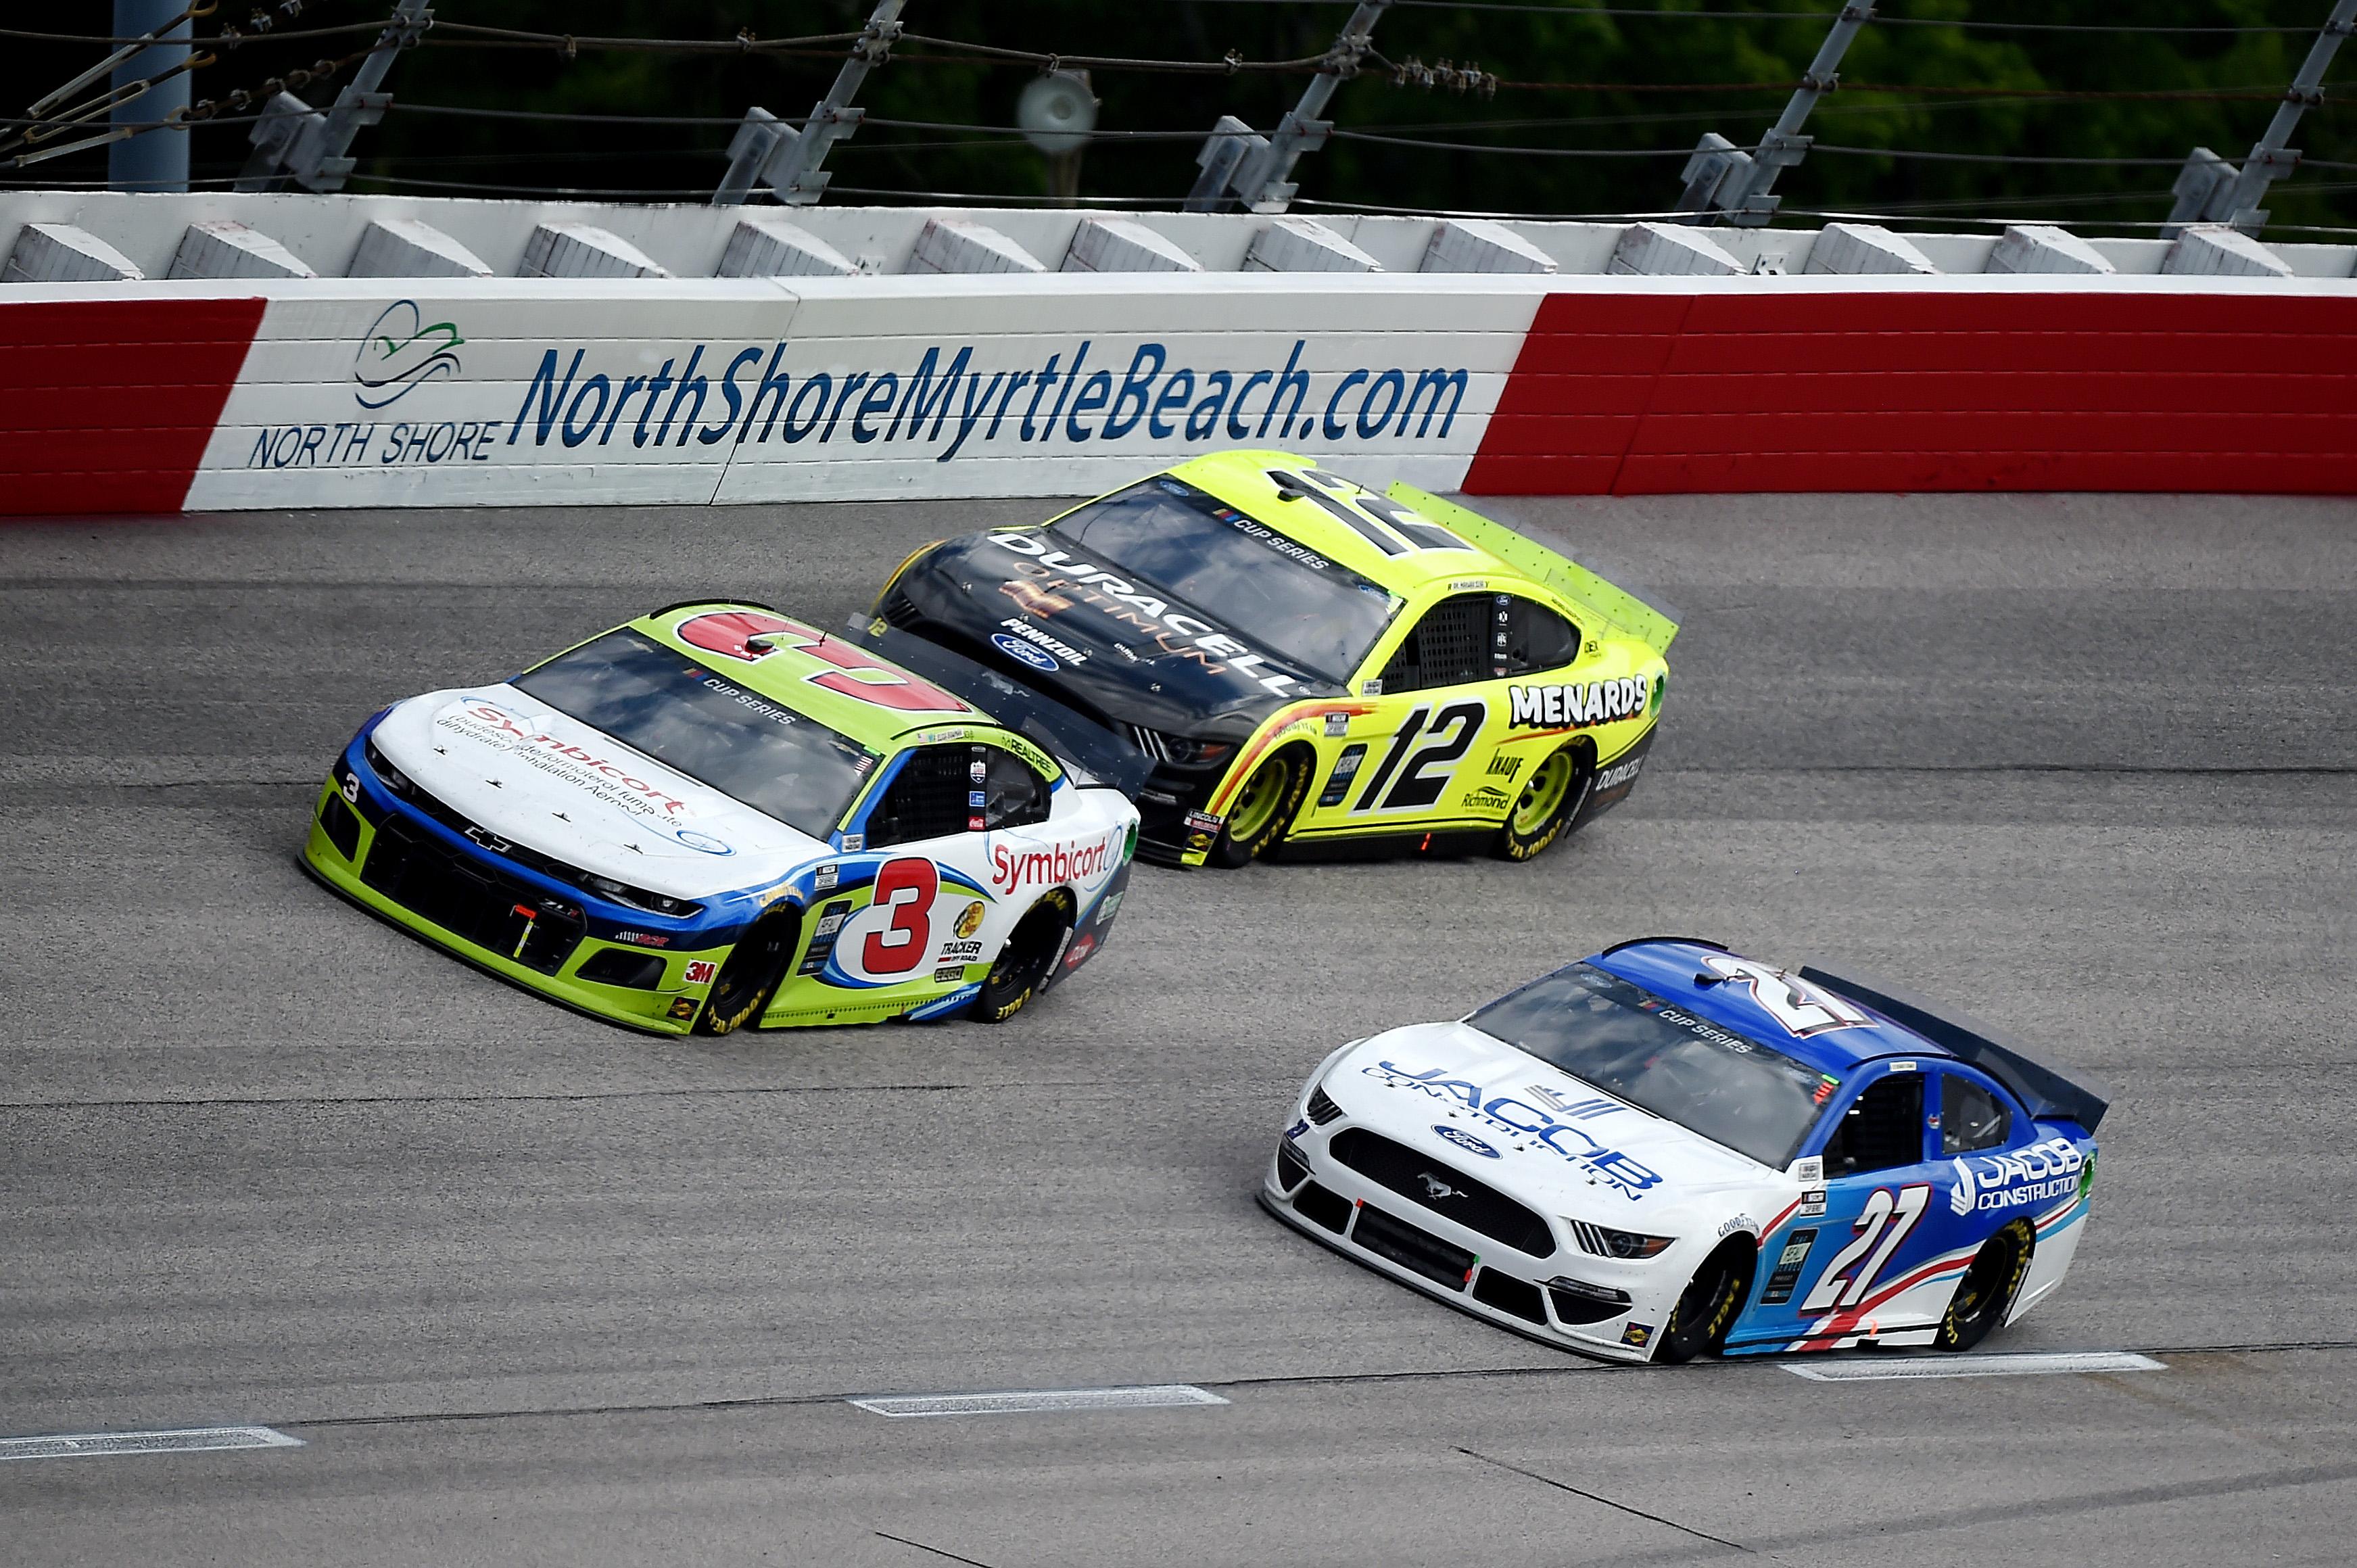 Darlington NASCAR 2020